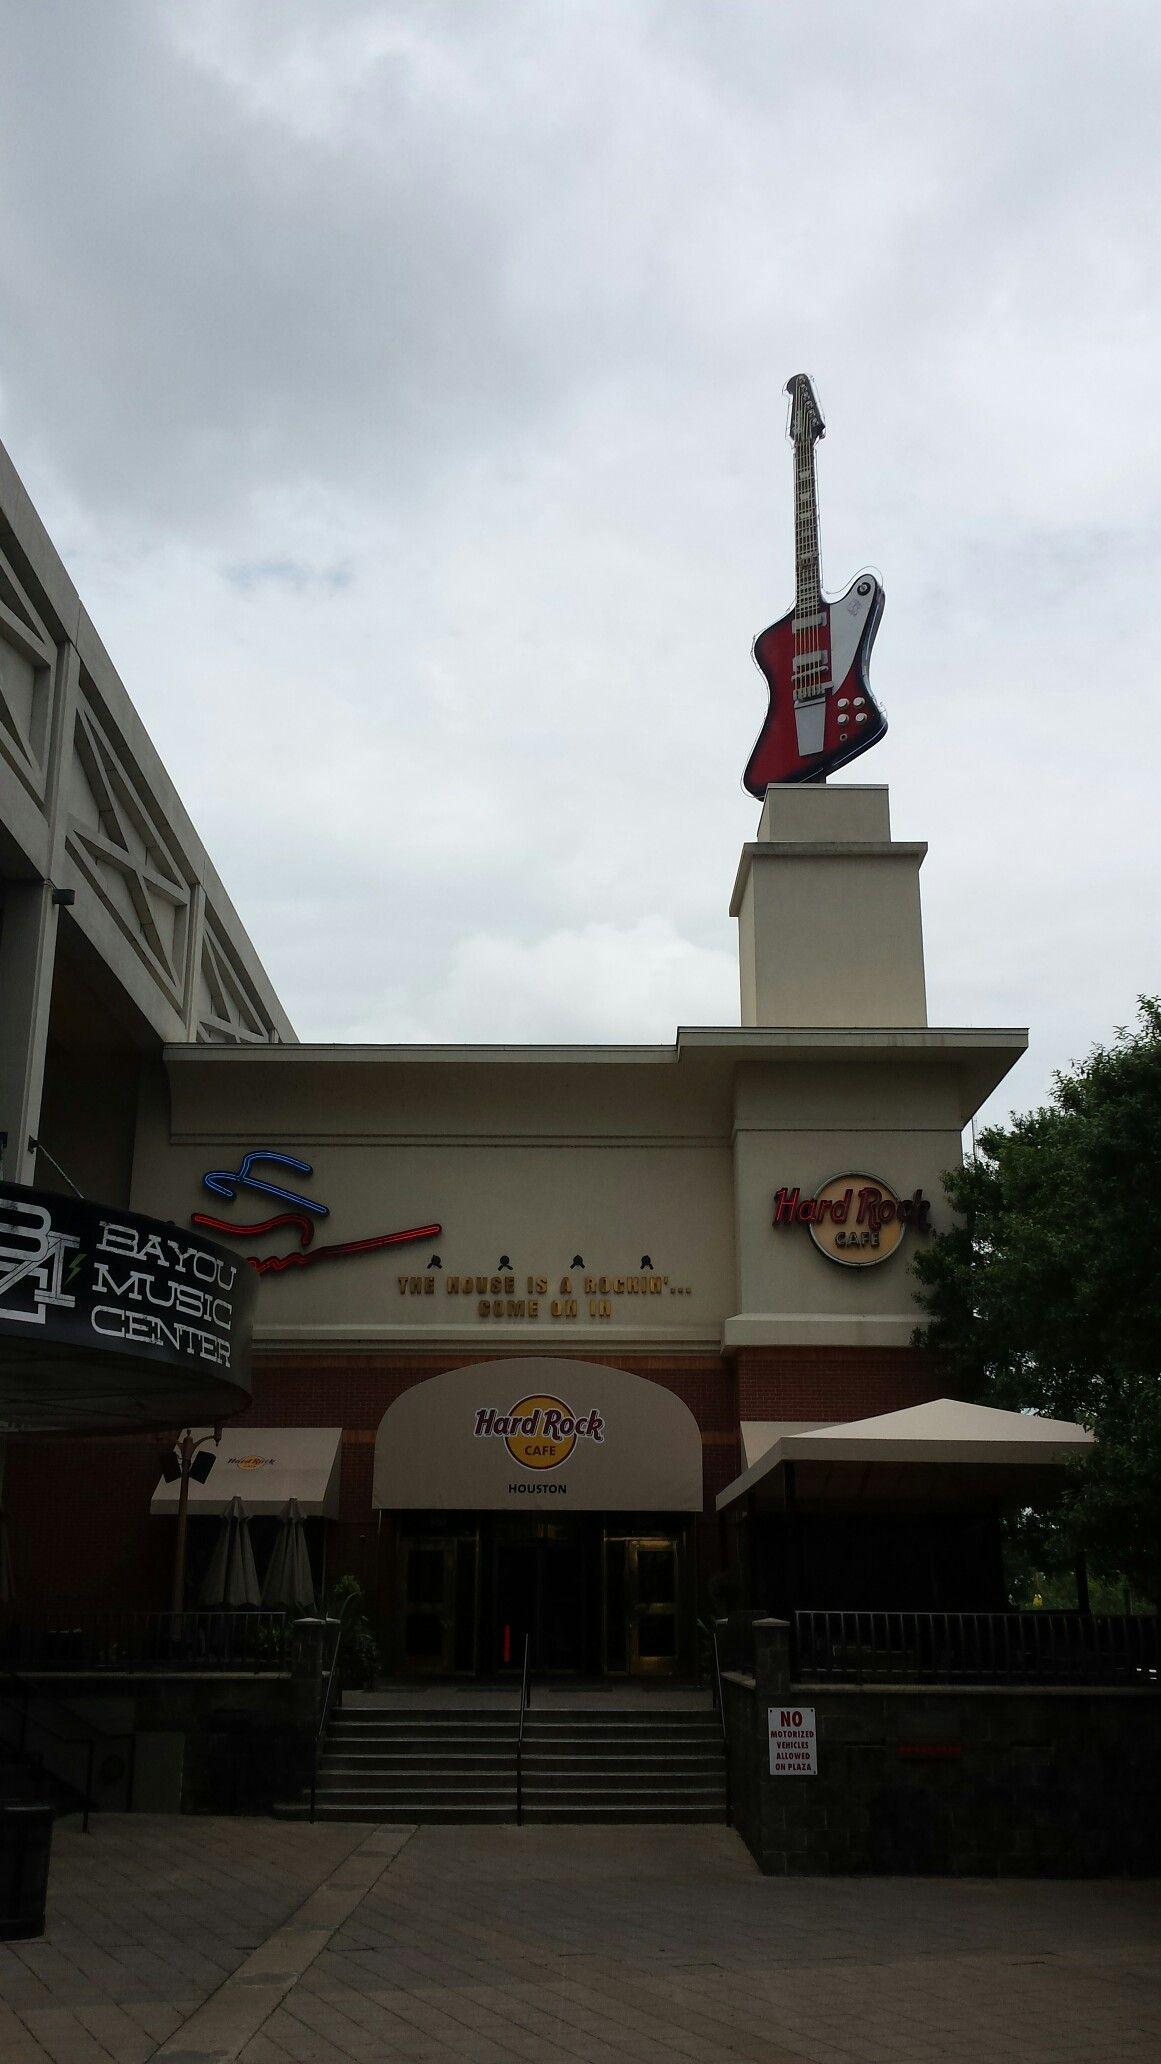 Hard Rock Houston Hard rock cafe, Hard rock, Rock